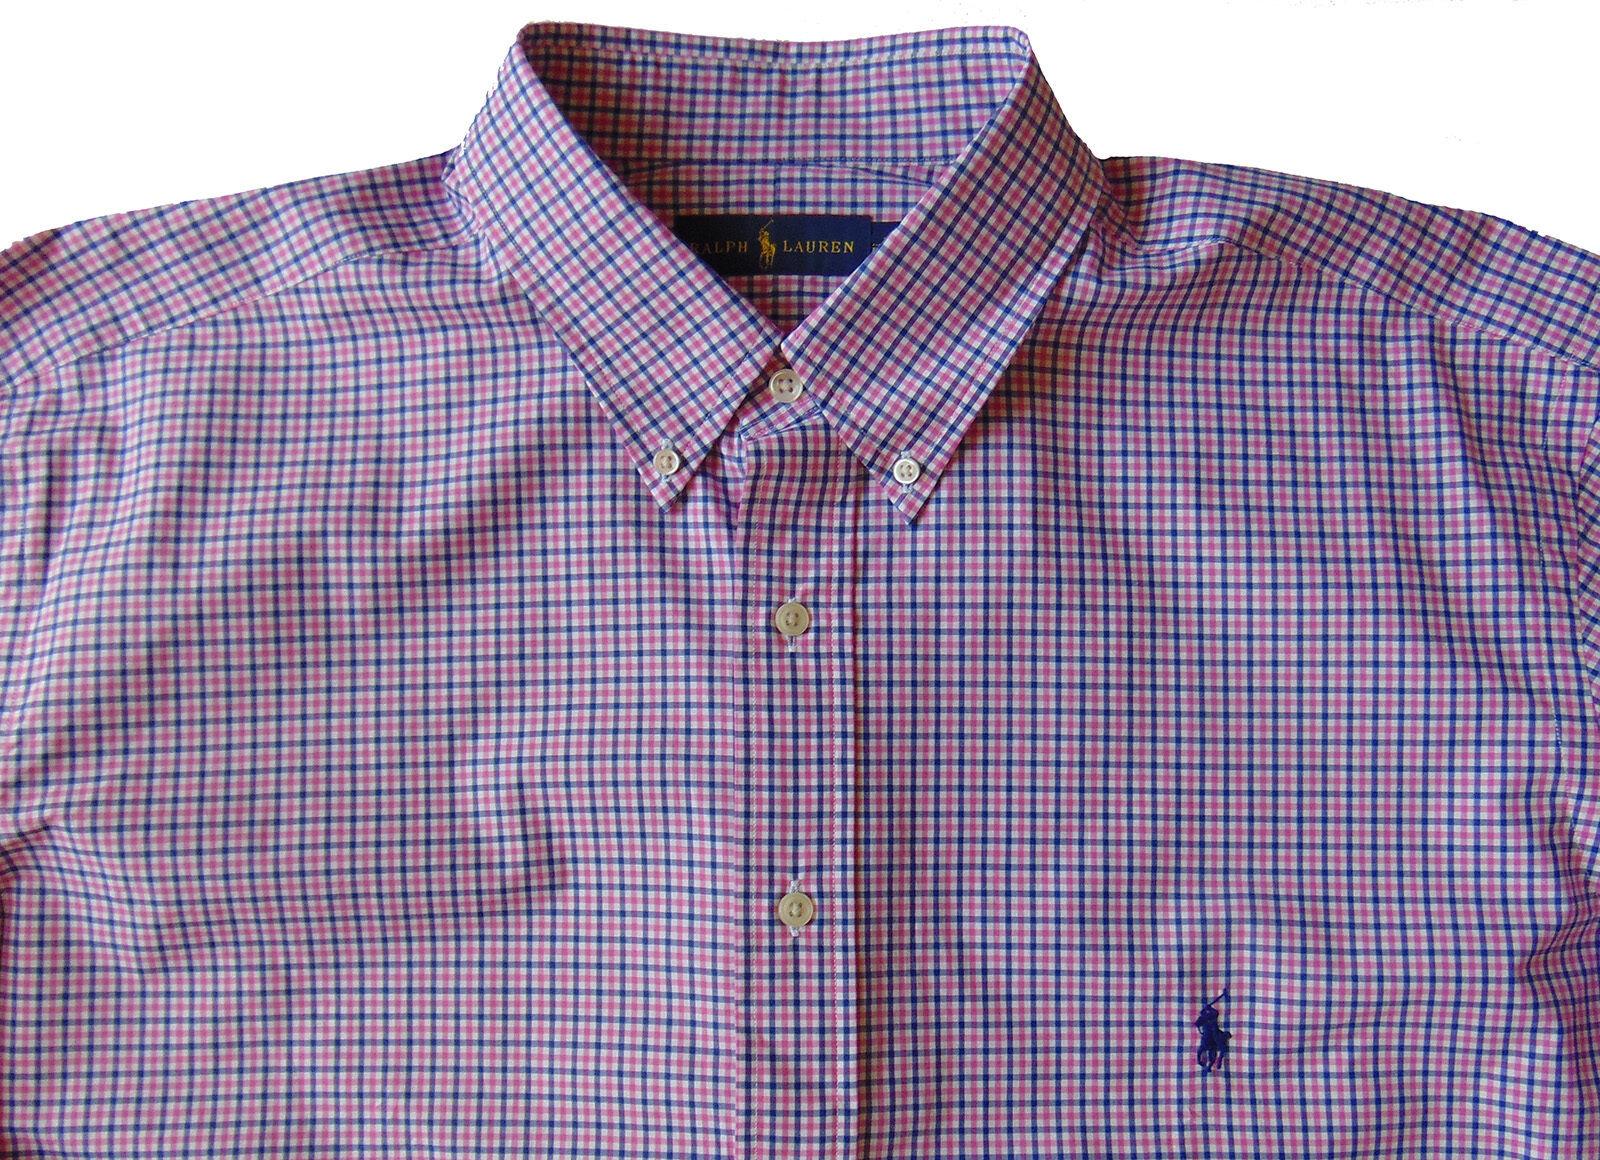 Men's RALPH LAUREN bluee Pink White Plaid Shirt LT TALL NWT NEW Amazing